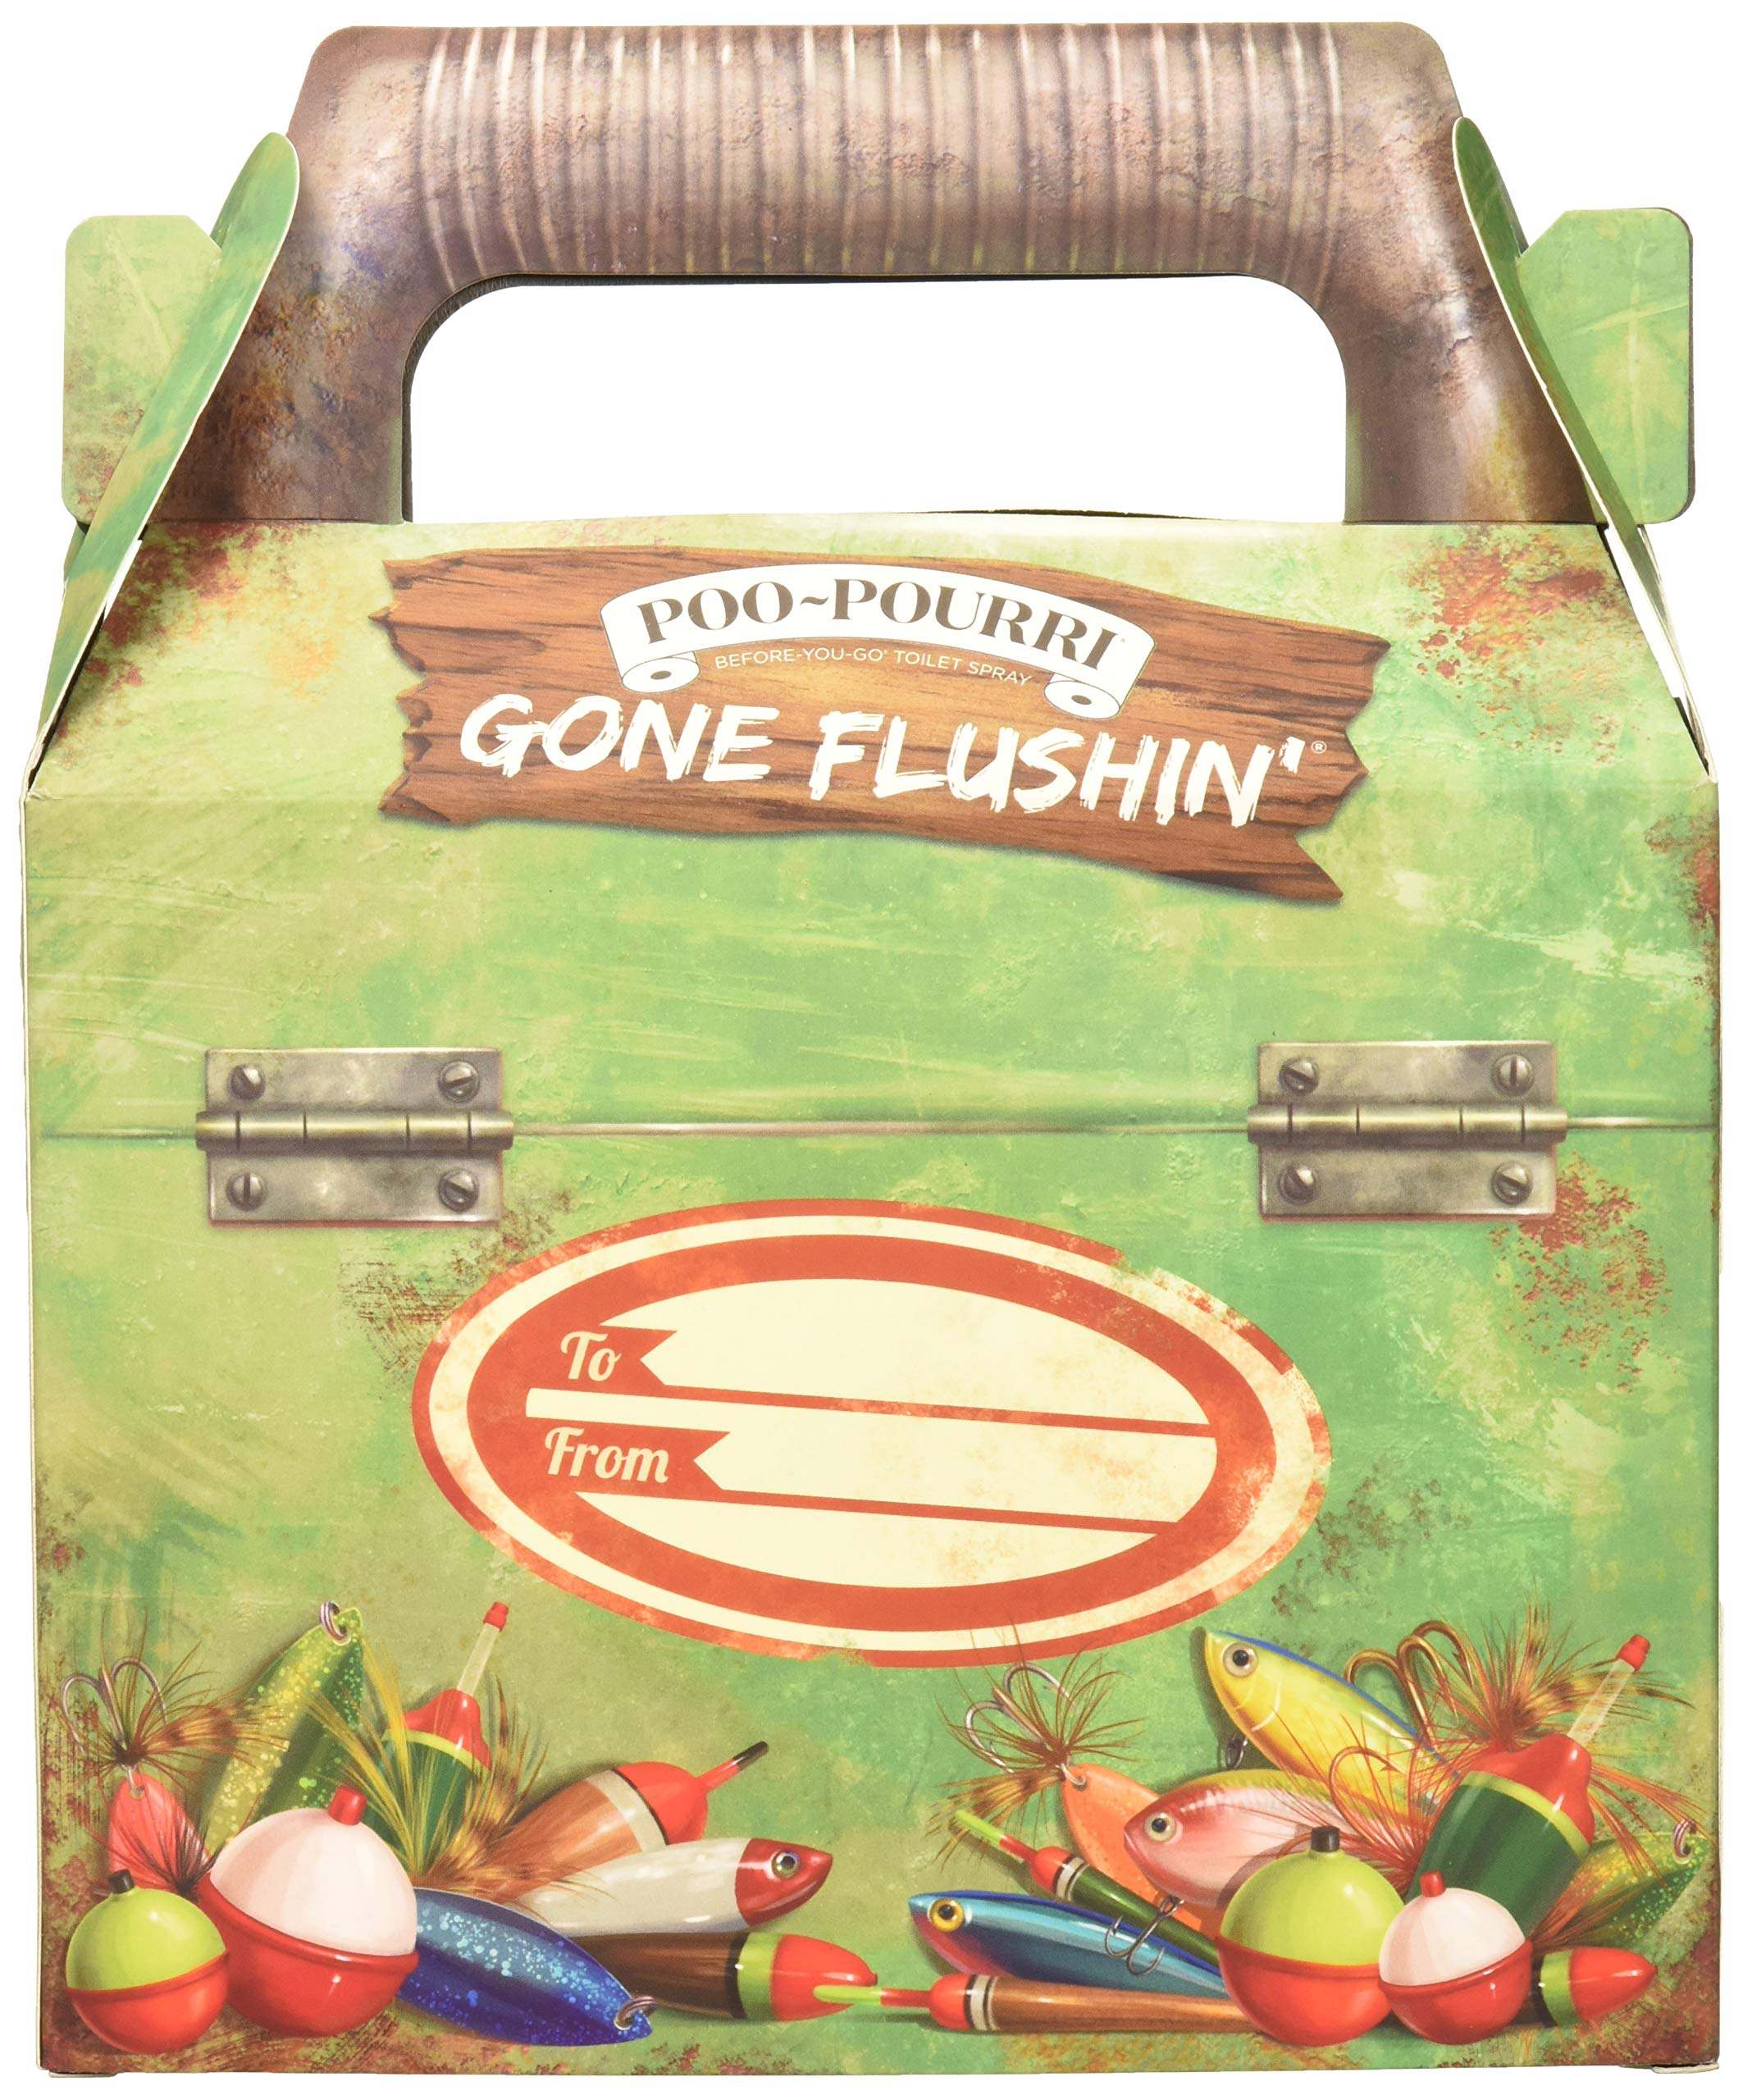 Poo-Pourri Gone Flushin Before You Go Toilet Spray Gift Set in Tackle Box by Poo-Pourri (Image #2)